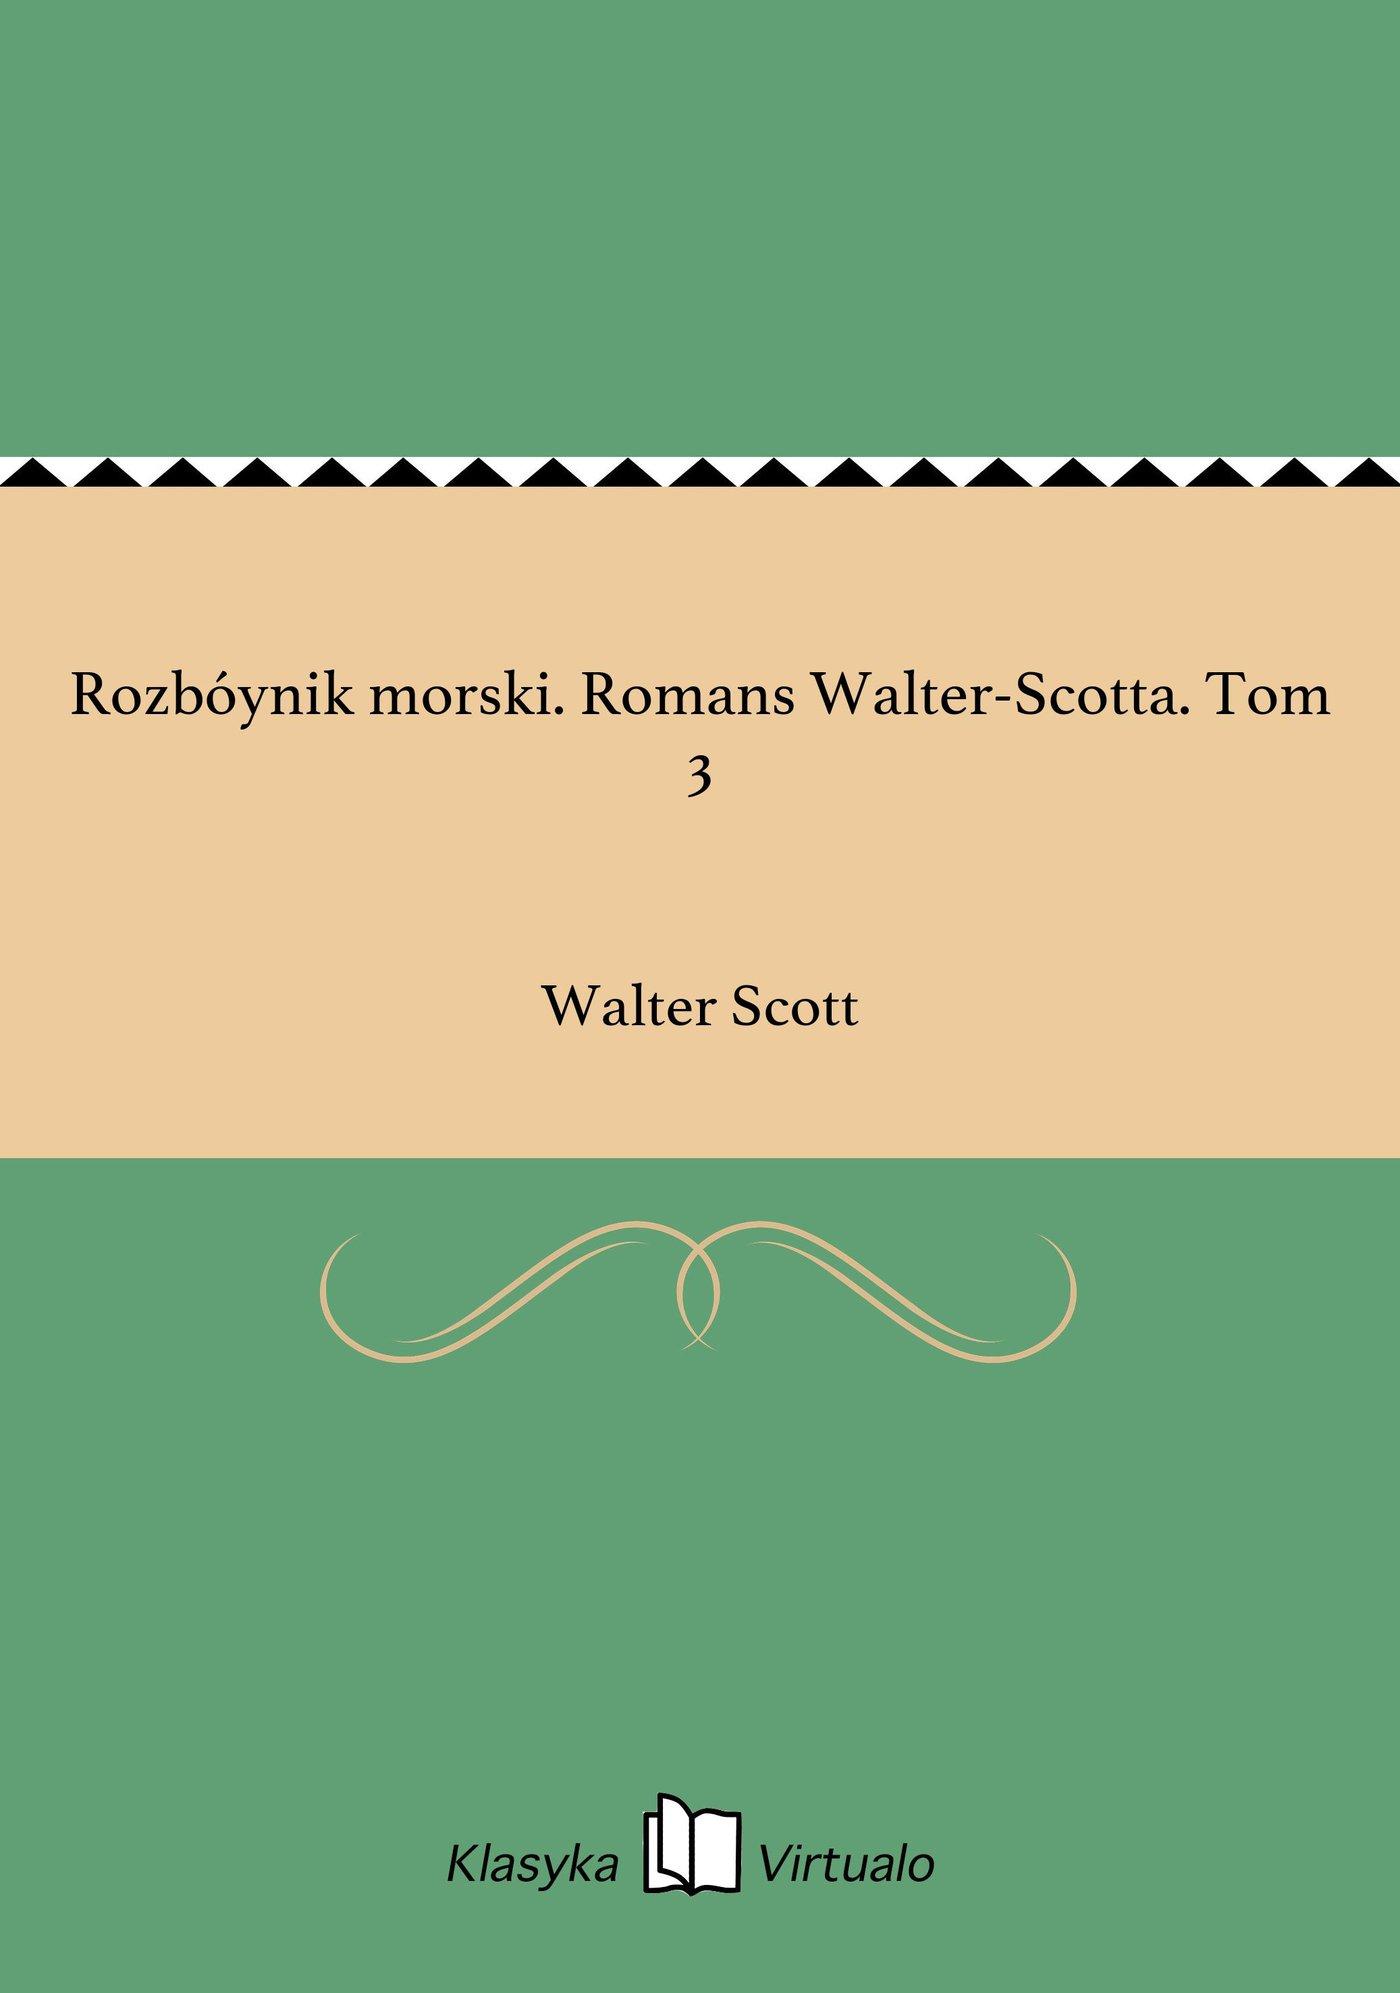 Rozbóynik morski. Romans Walter-Scotta. Tom 3 - Ebook (Książka EPUB) do pobrania w formacie EPUB